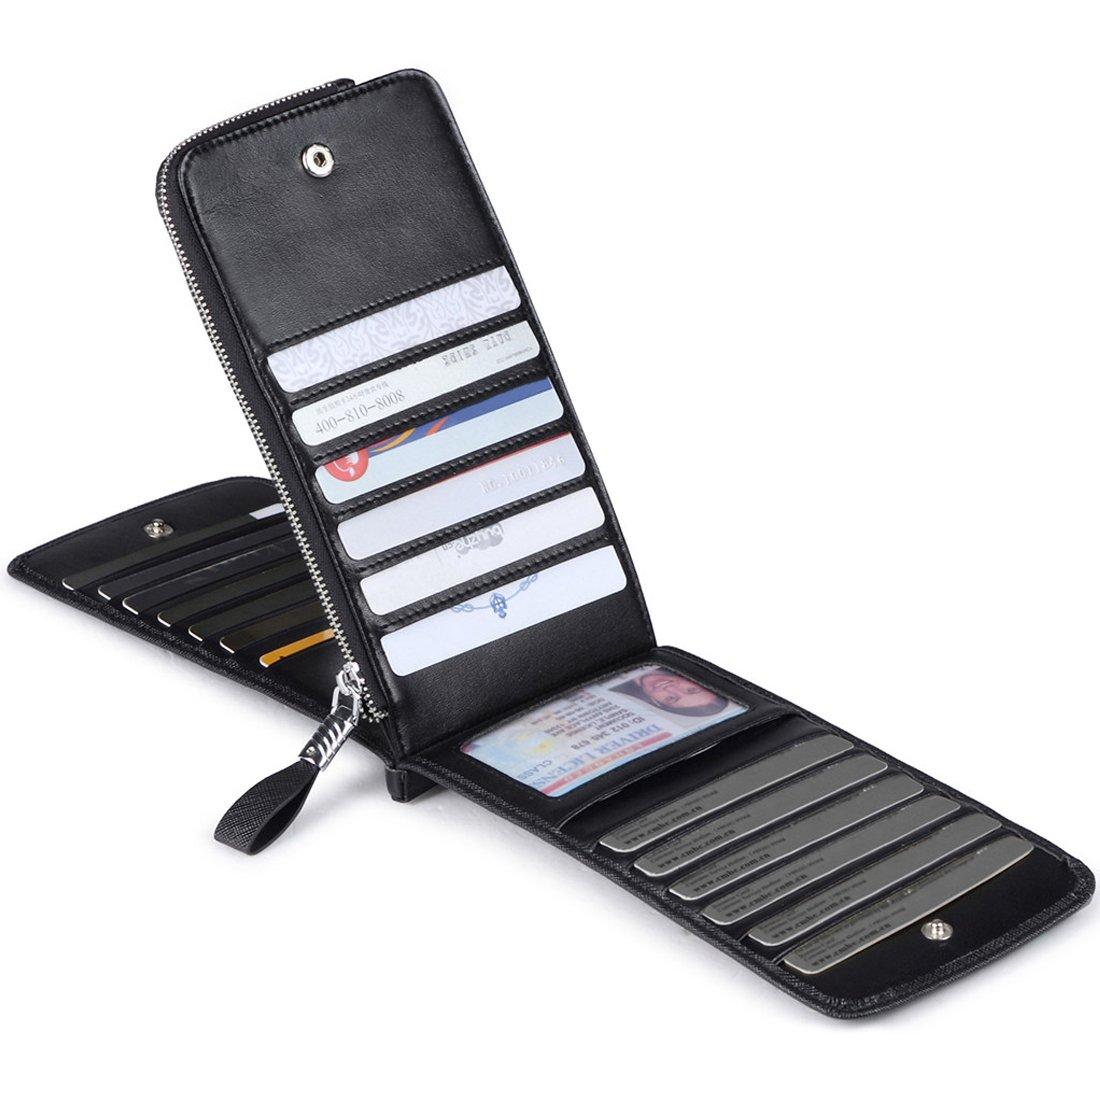 Huztencor Women's Credit Card Holder RFID Blocking Leather Multi Card Organizer Wallet Slim Long Zipper Bi-fold Business Card Case Clutch Wallet with ID Window Black (FBA) by Huztencor (Image #2)